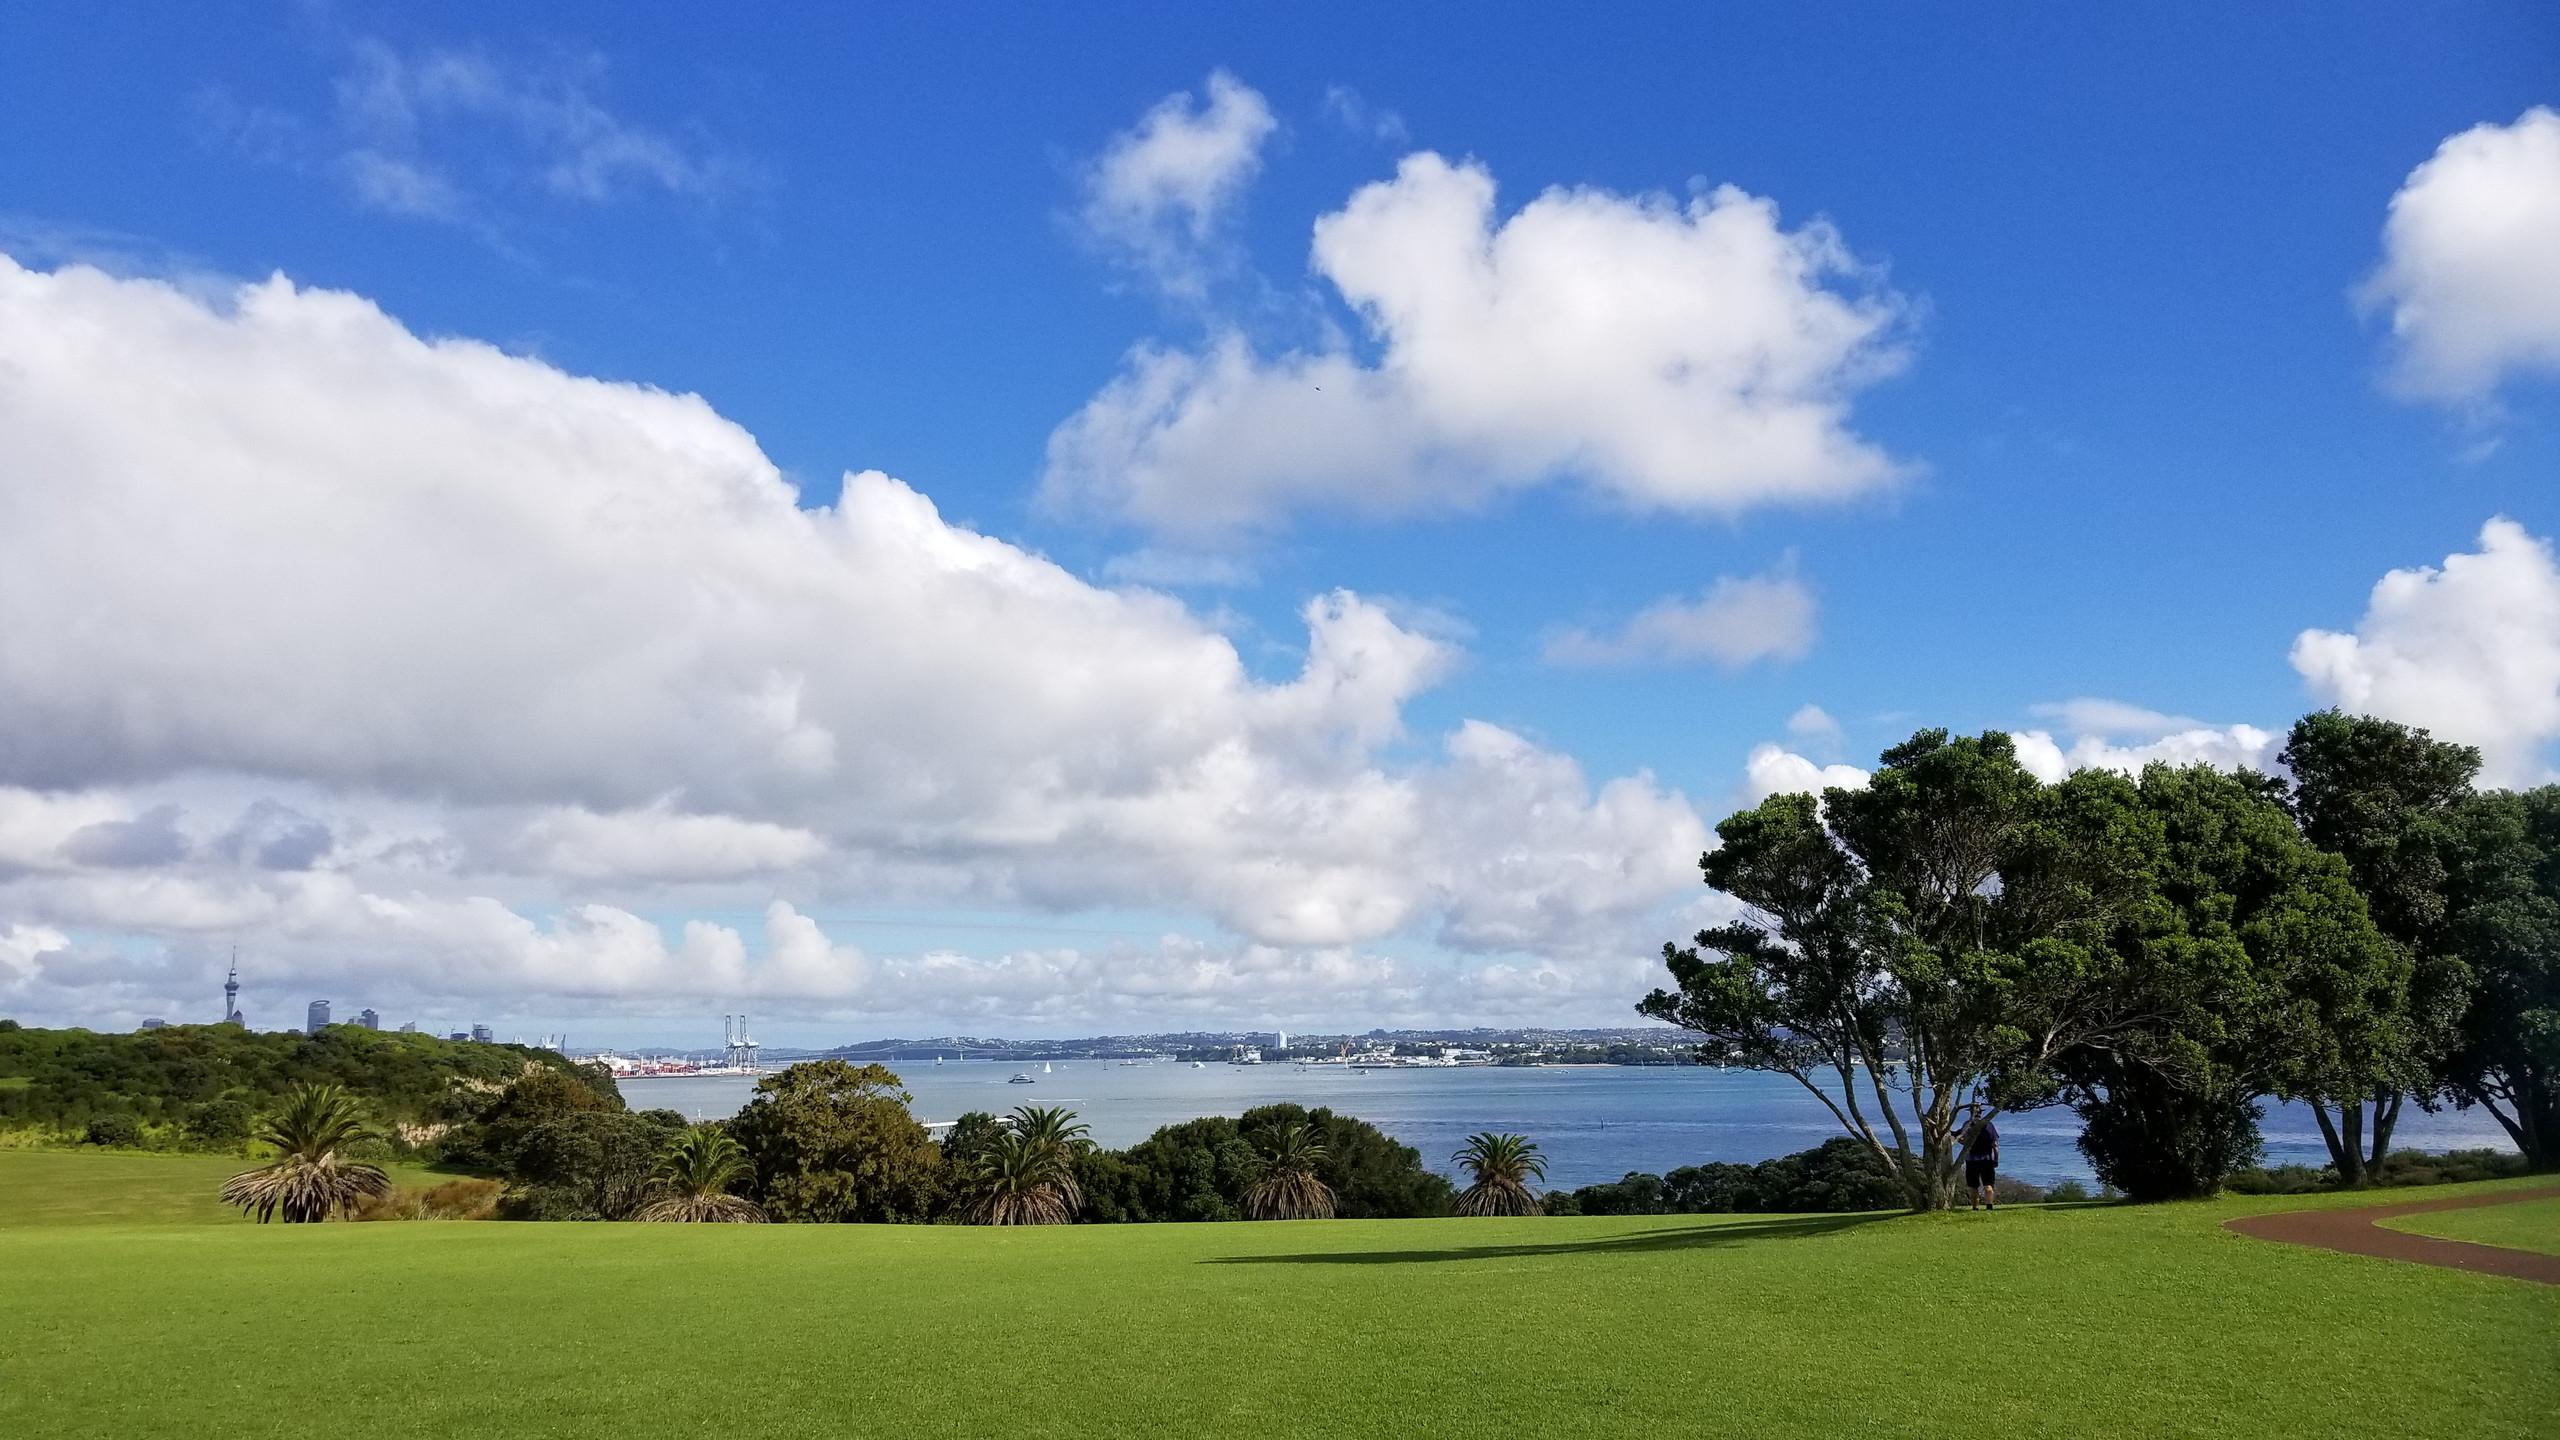 Auckland sights New Zealand, New Zealand attractions, New Zealand activities